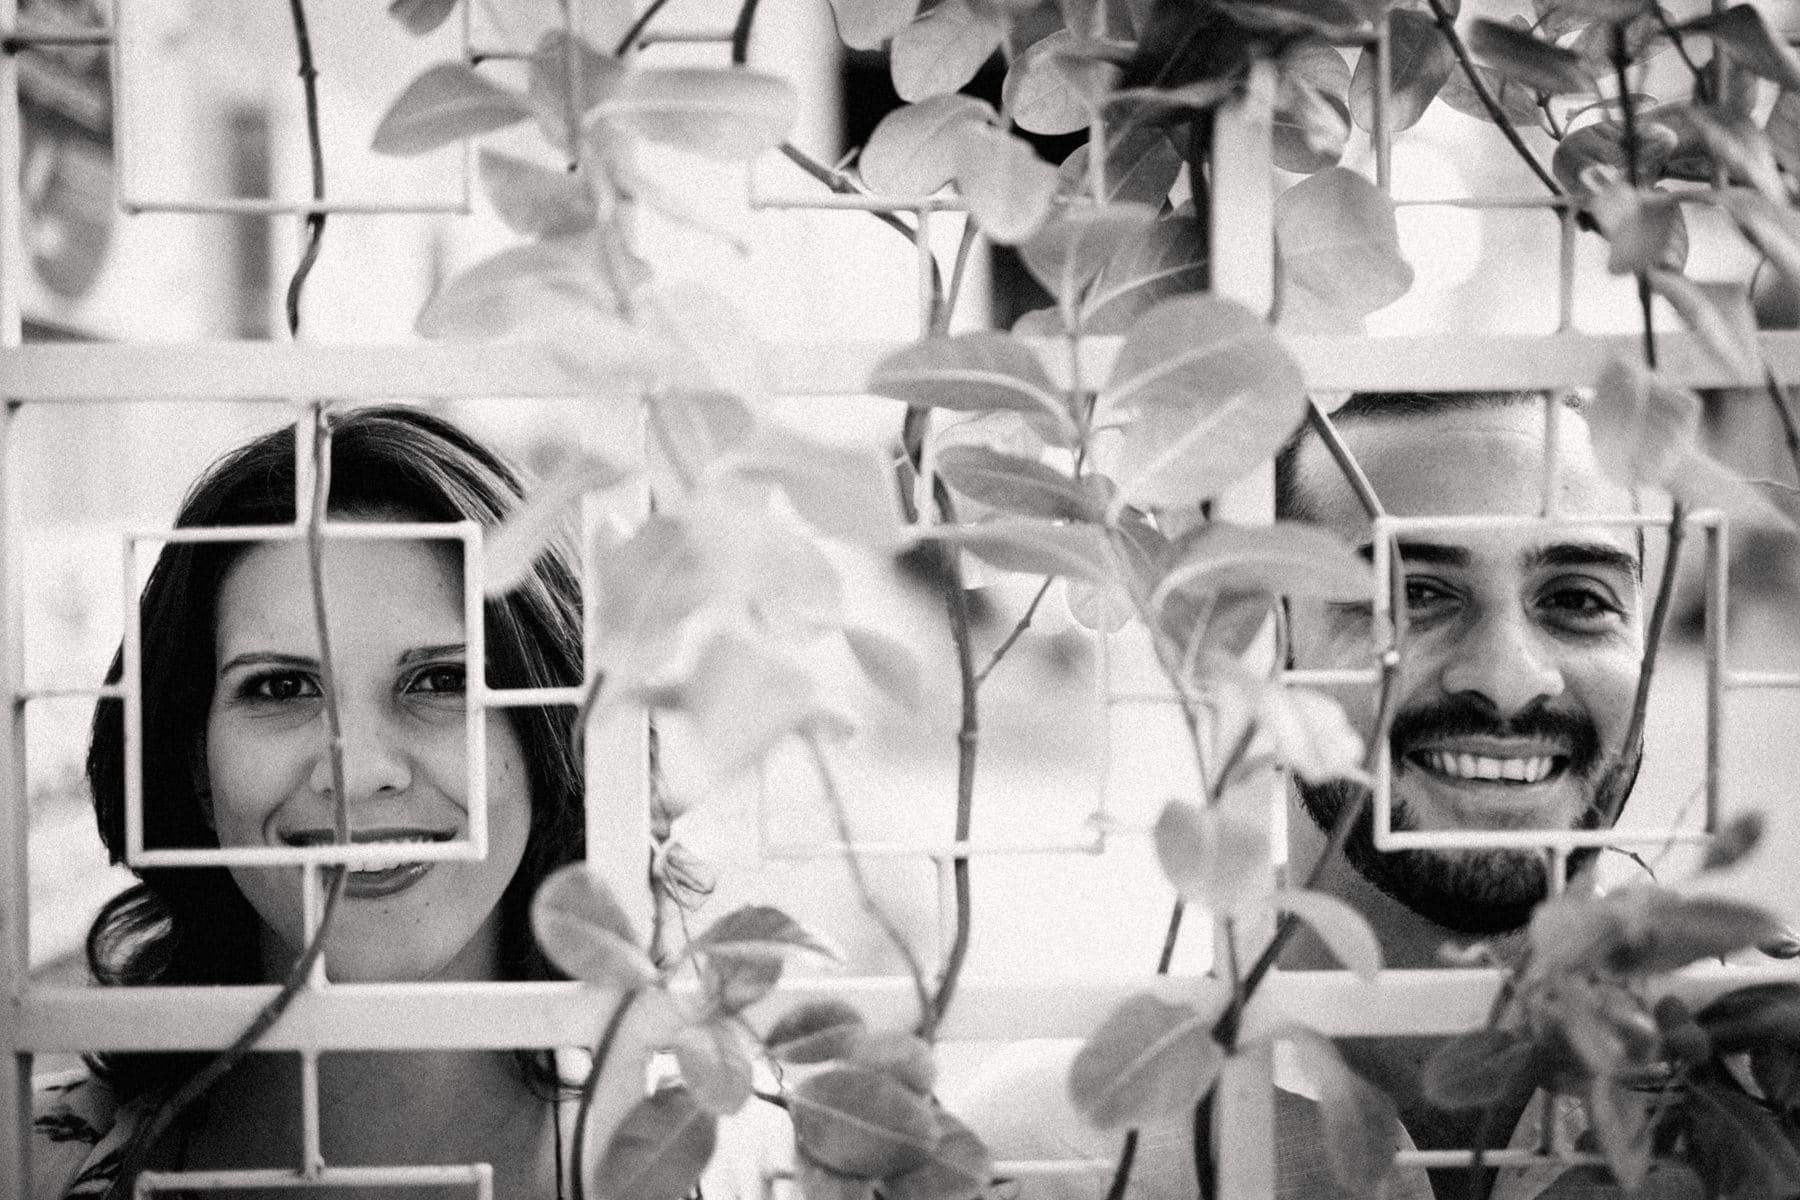 wedding photographer based in ceara